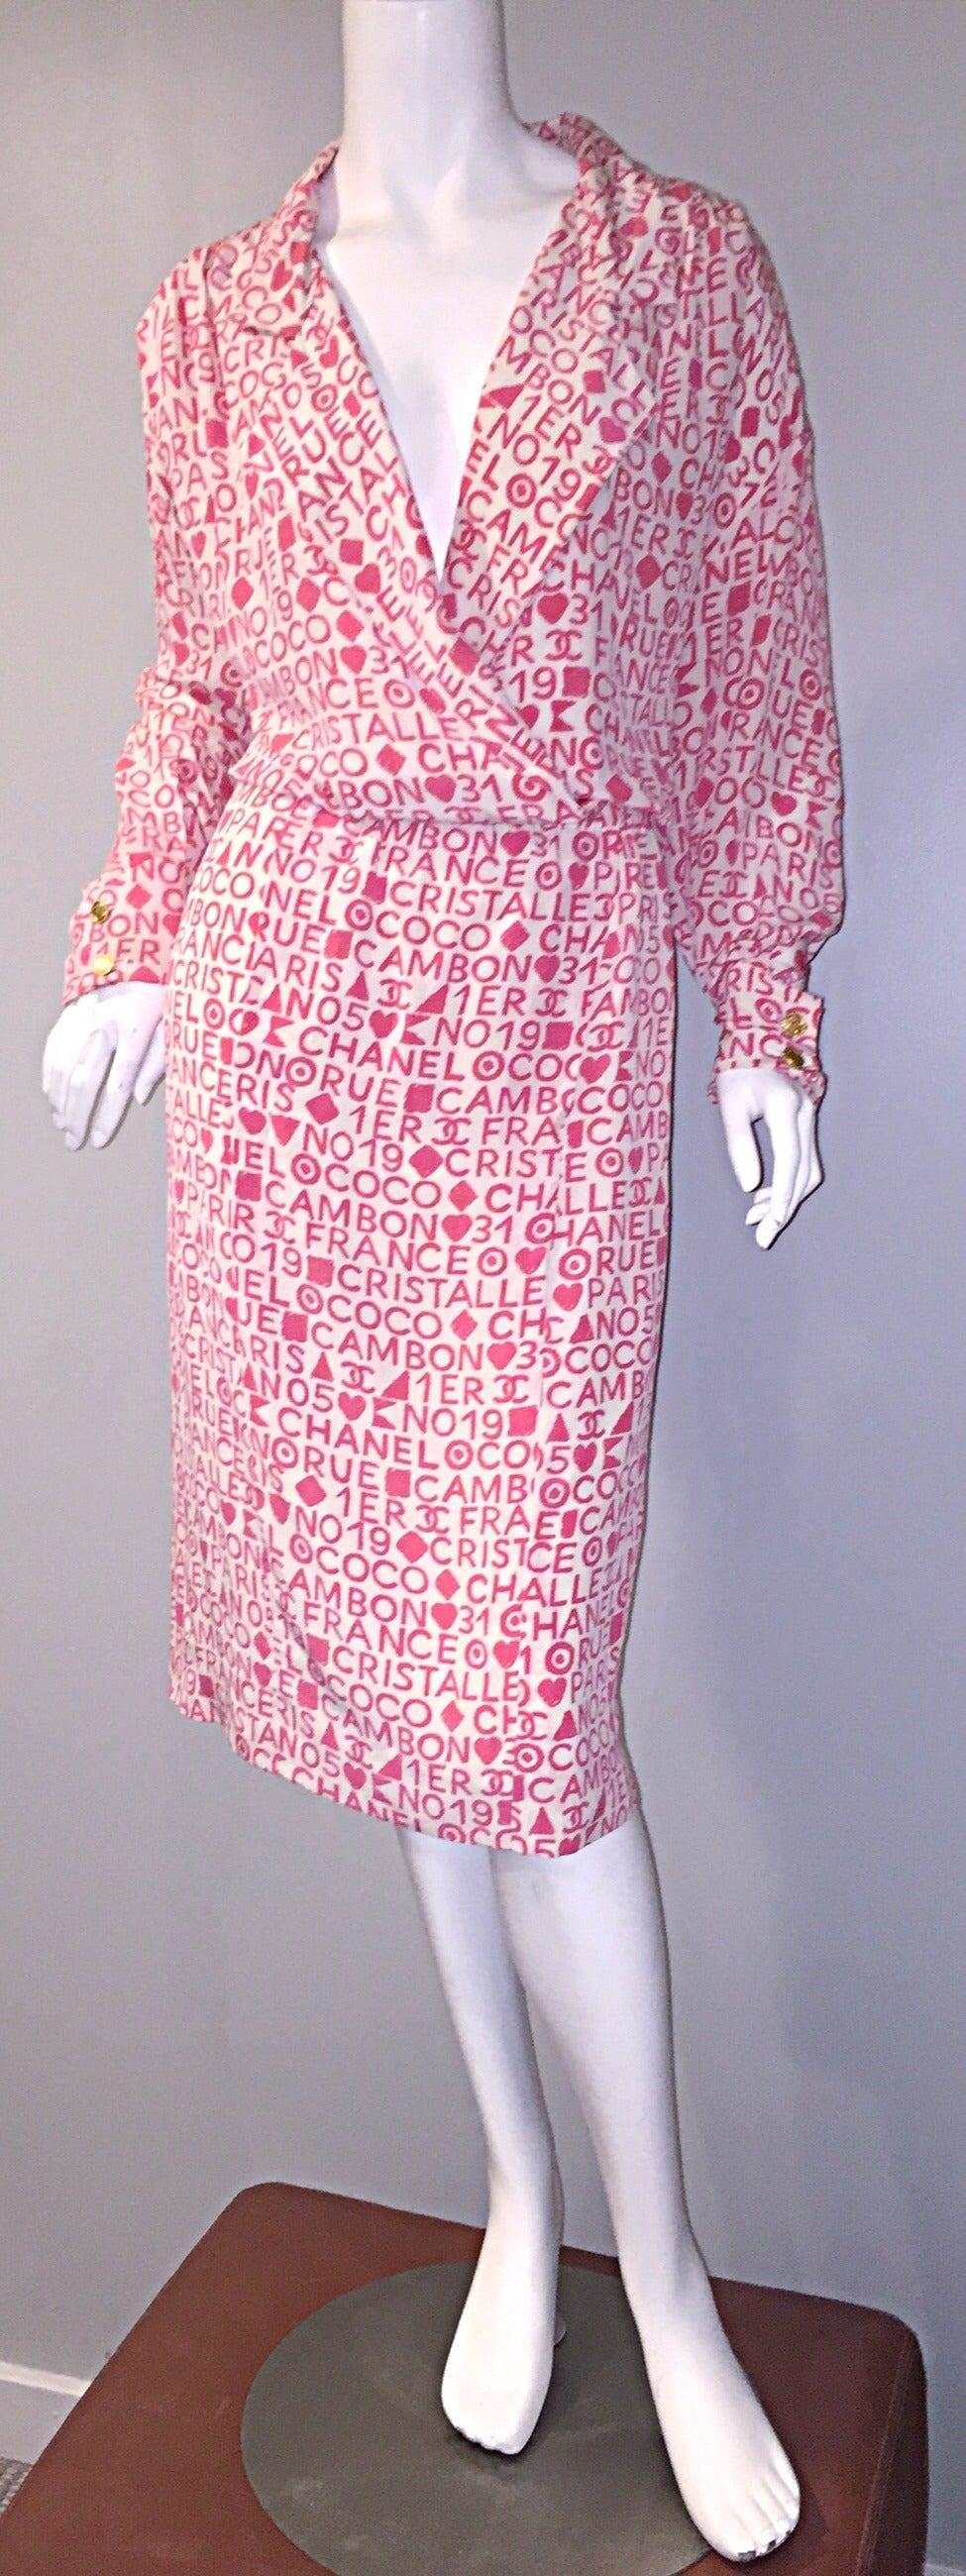 Rare Vintage Chanel Pink White Logo Graffiti Silk Shirt